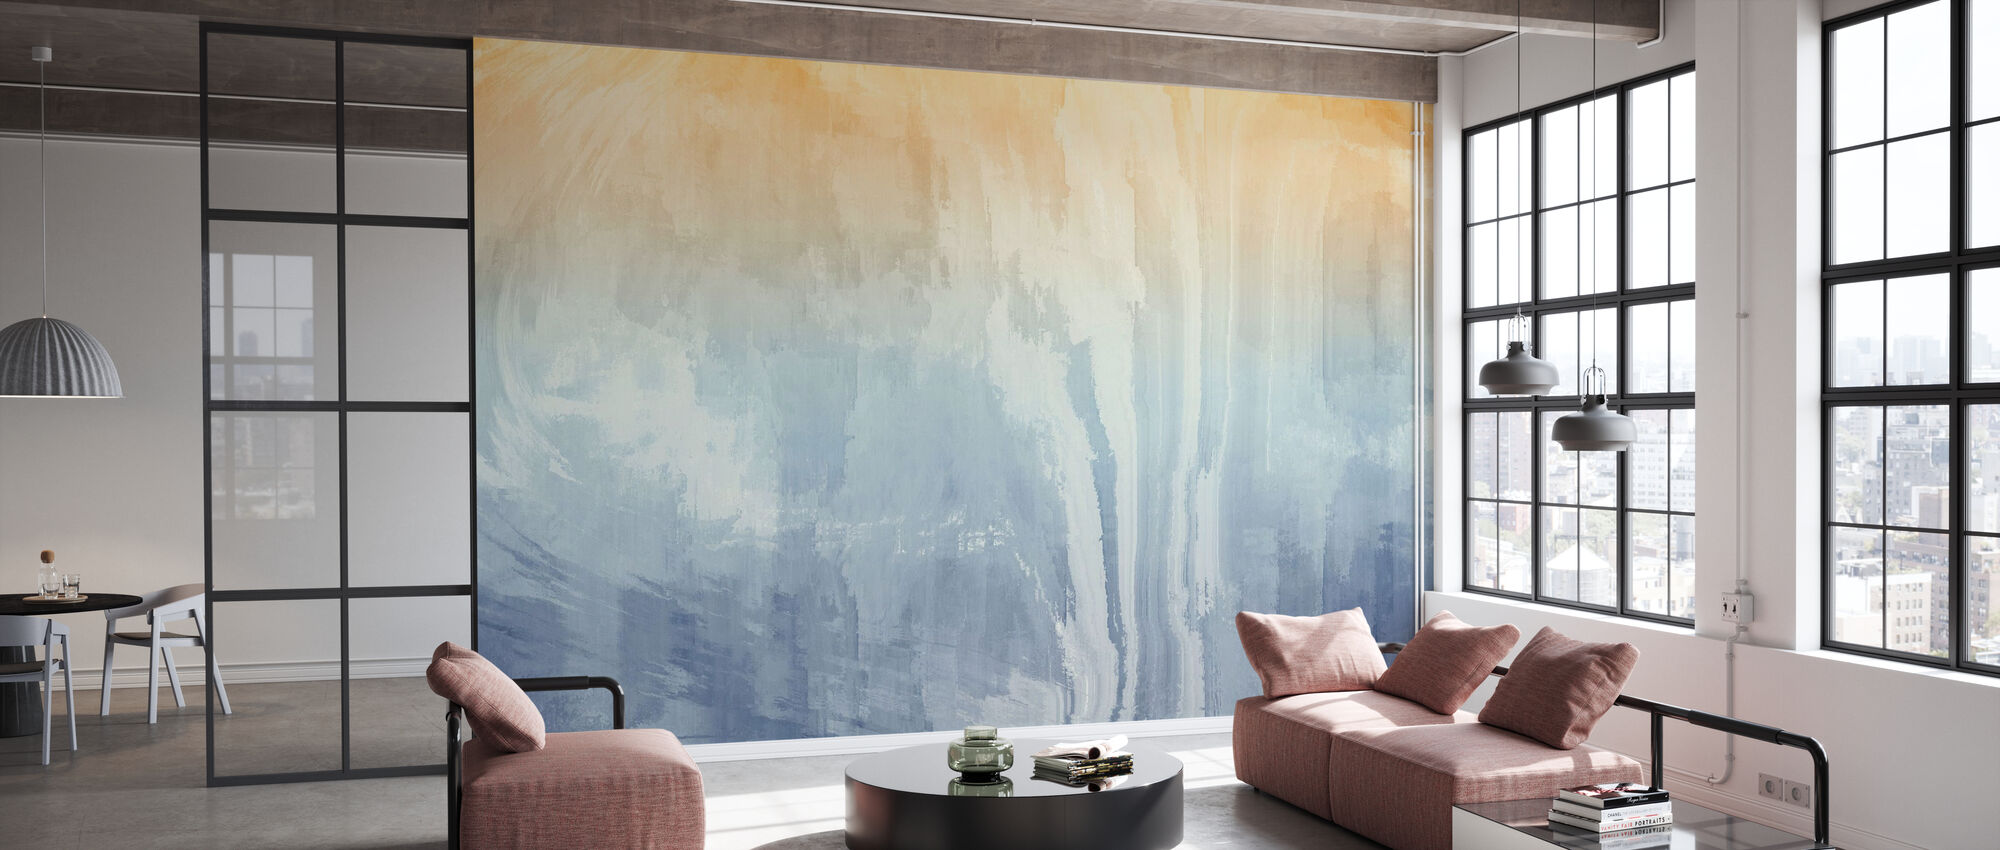 Rough Watercolors - Wallpaper - Office